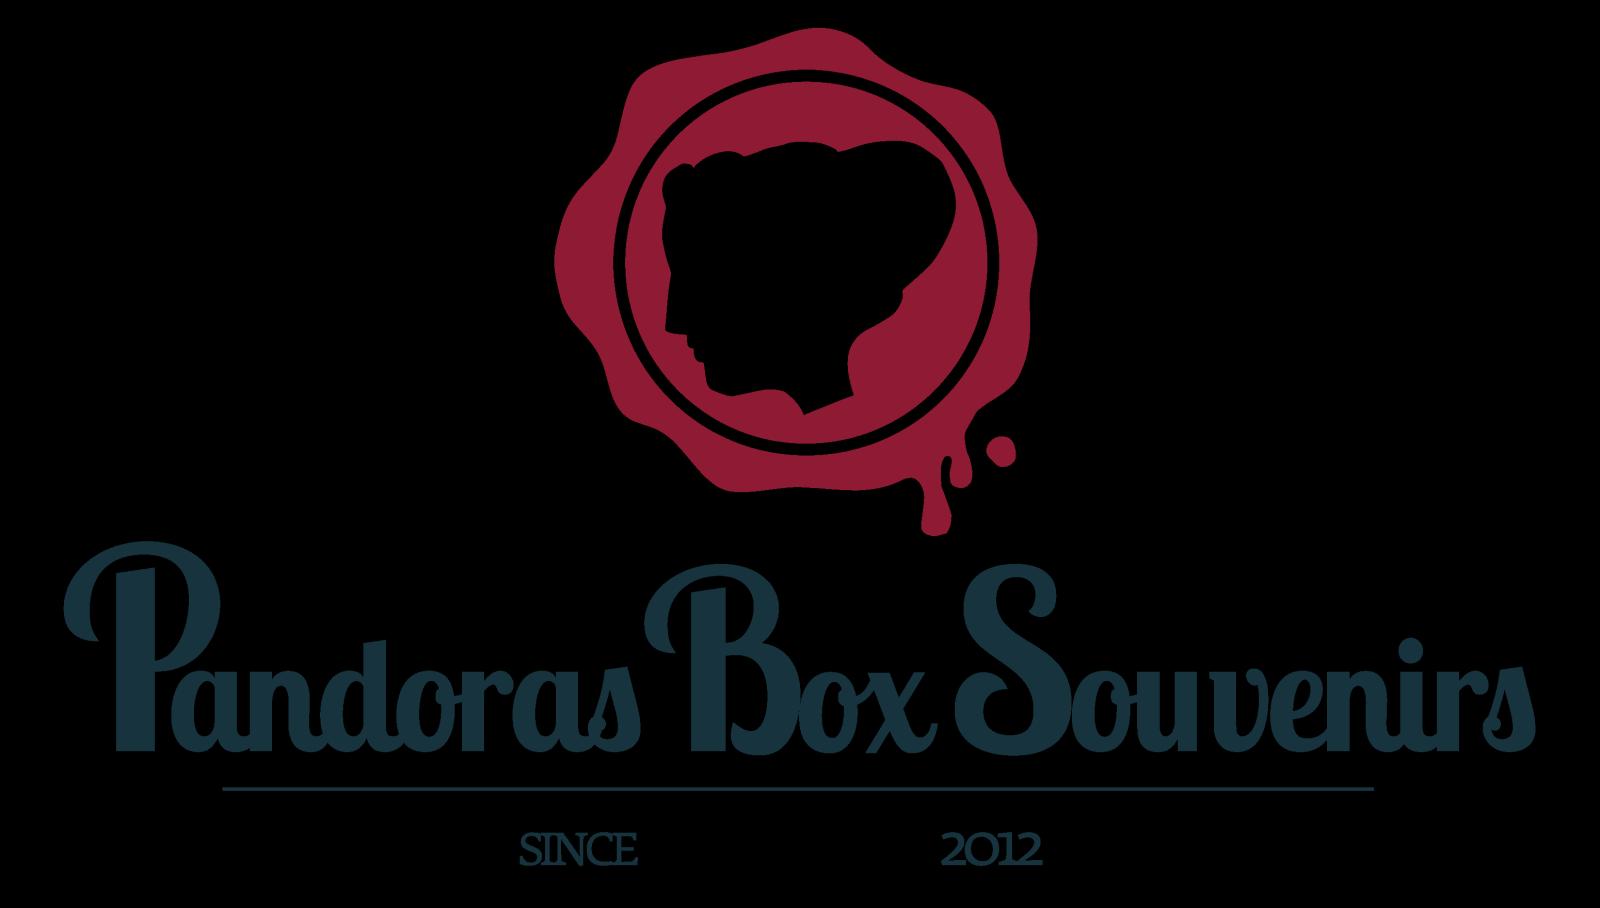 Pandorasboxsouvenirs